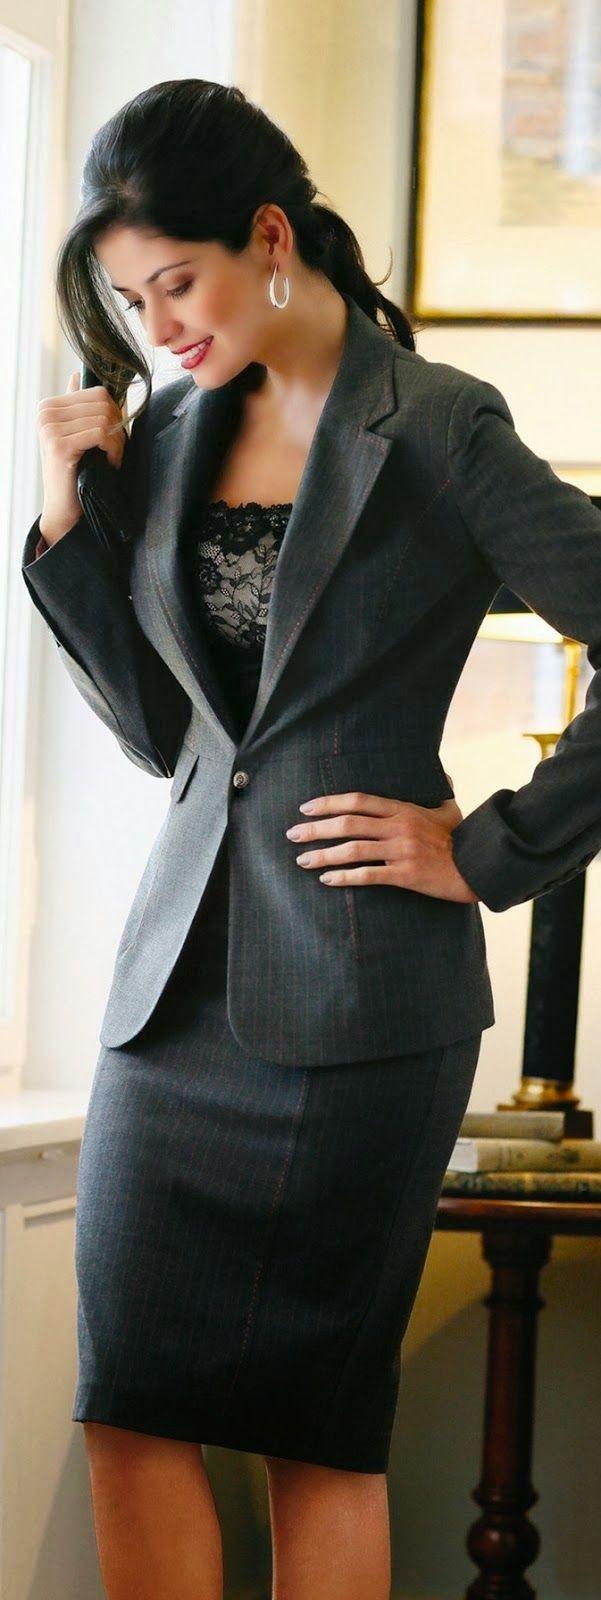 Ladies/Beauty/Fashion/Style  MULHERES/BELEZA/ MODA/ESTILO